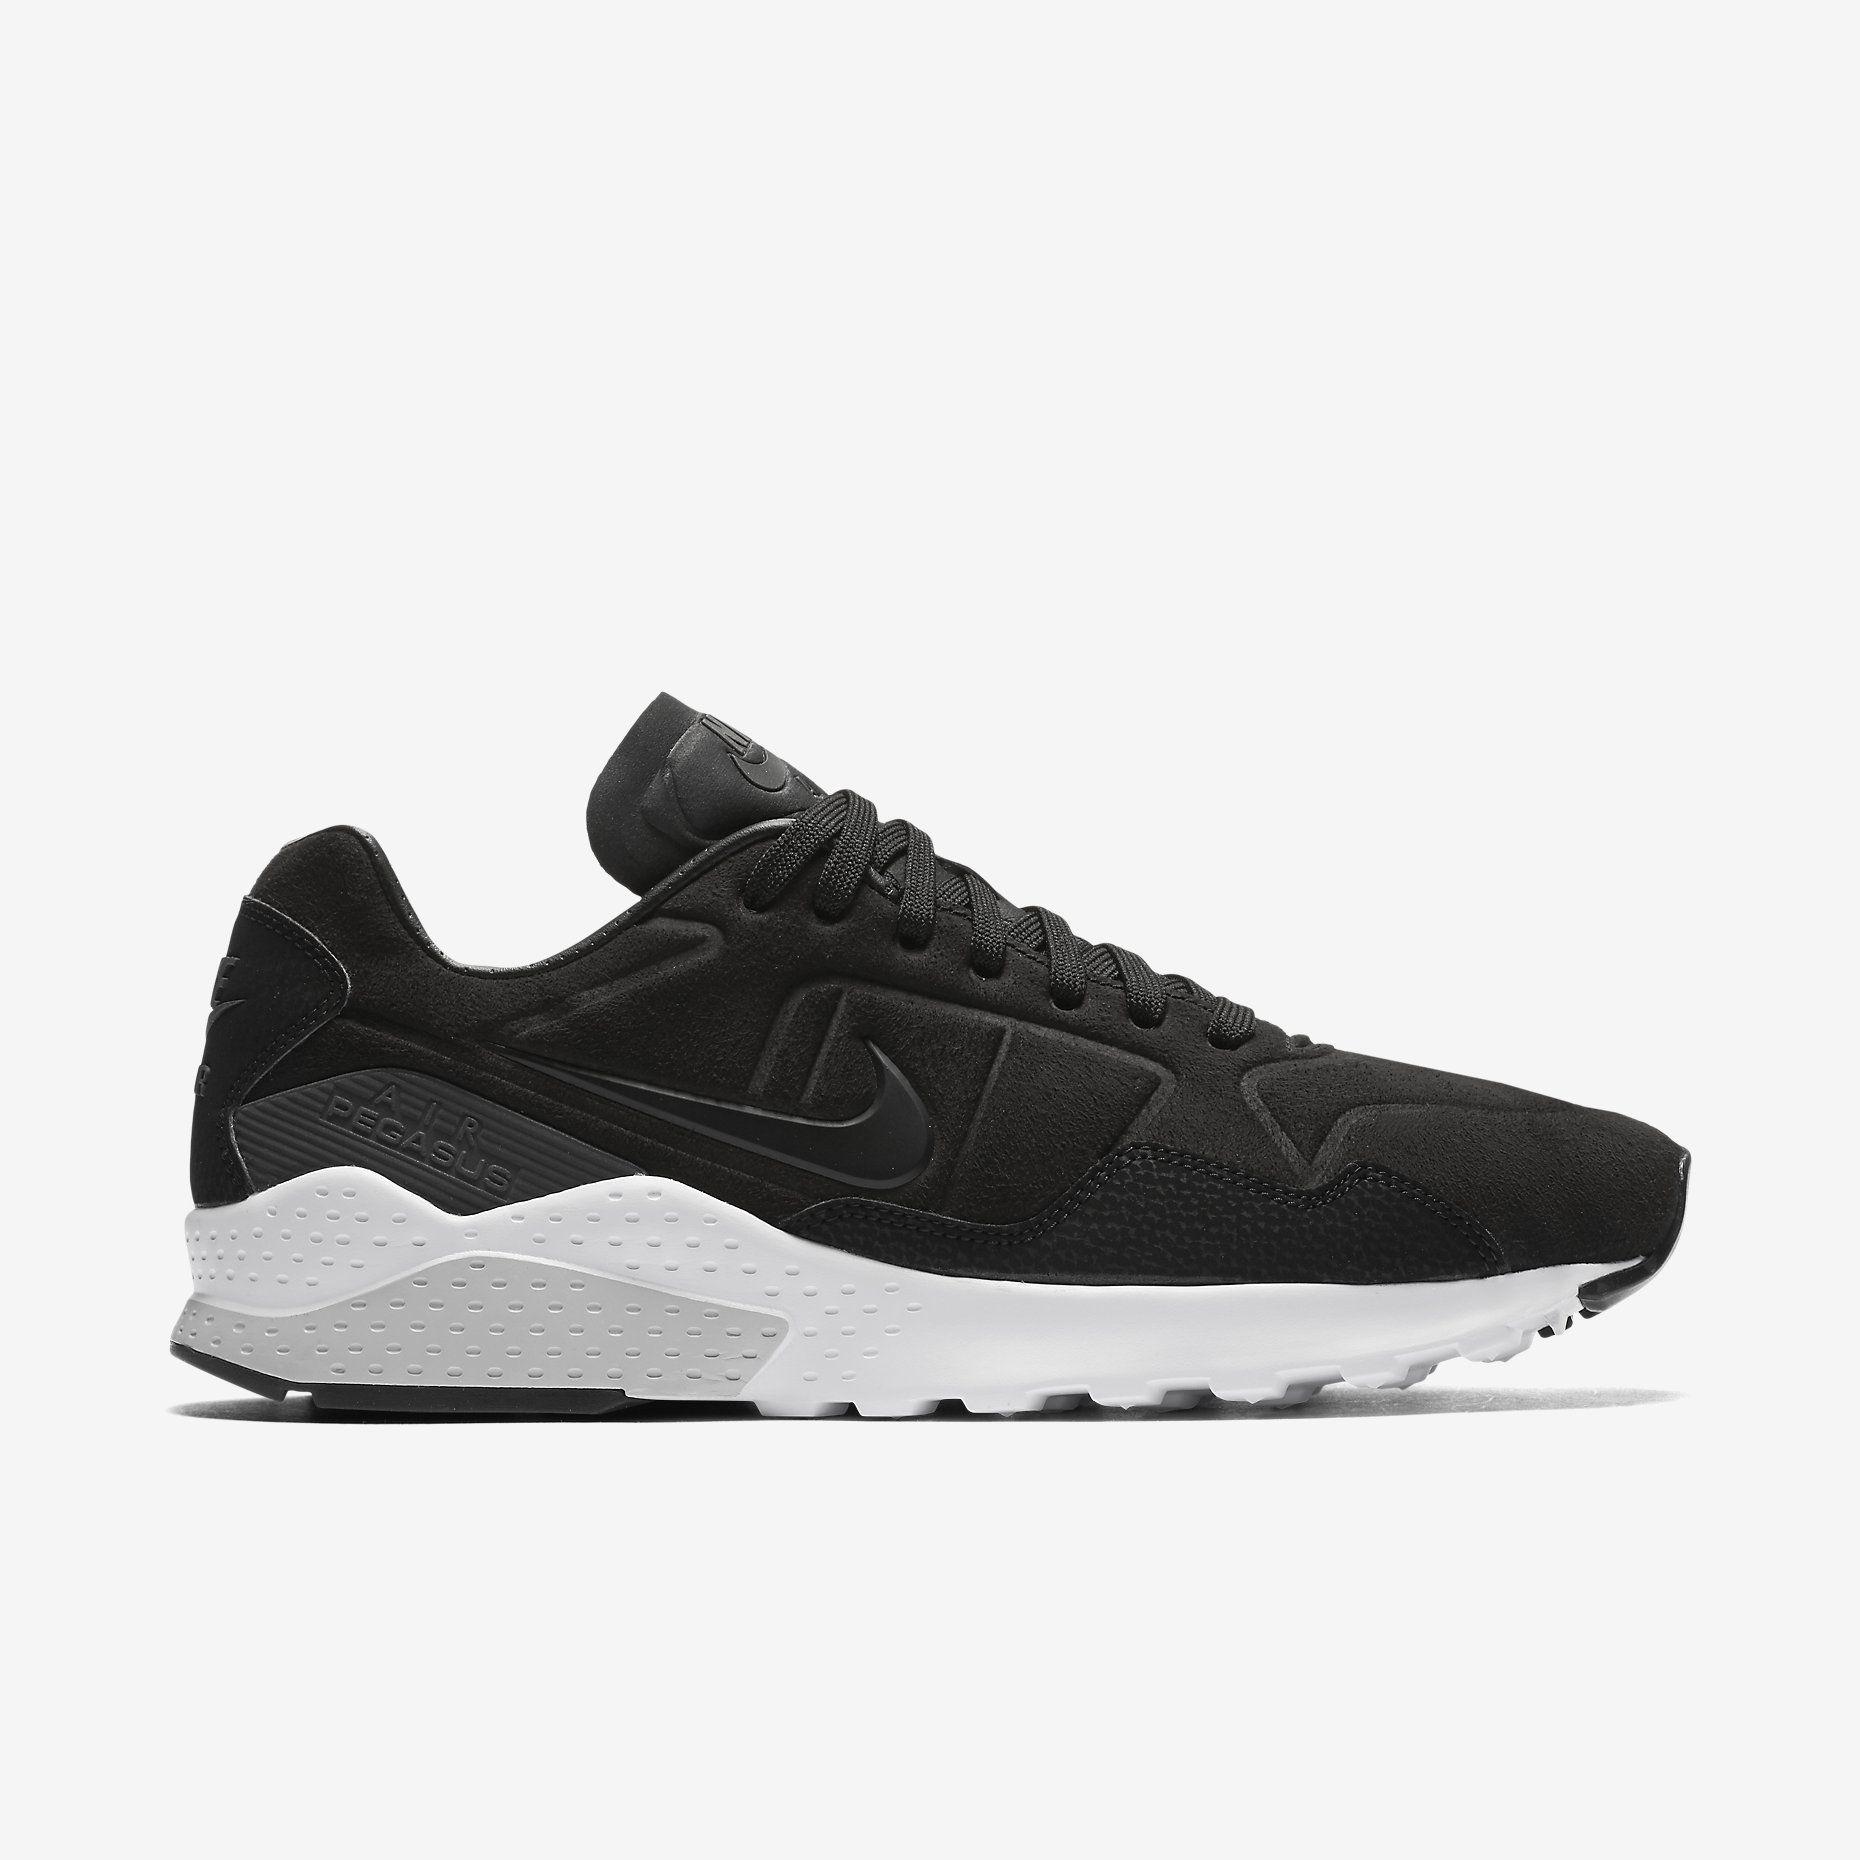 Nike Air Zoom Pegasus 92 Premium (Black/White/Anthracite/Black)